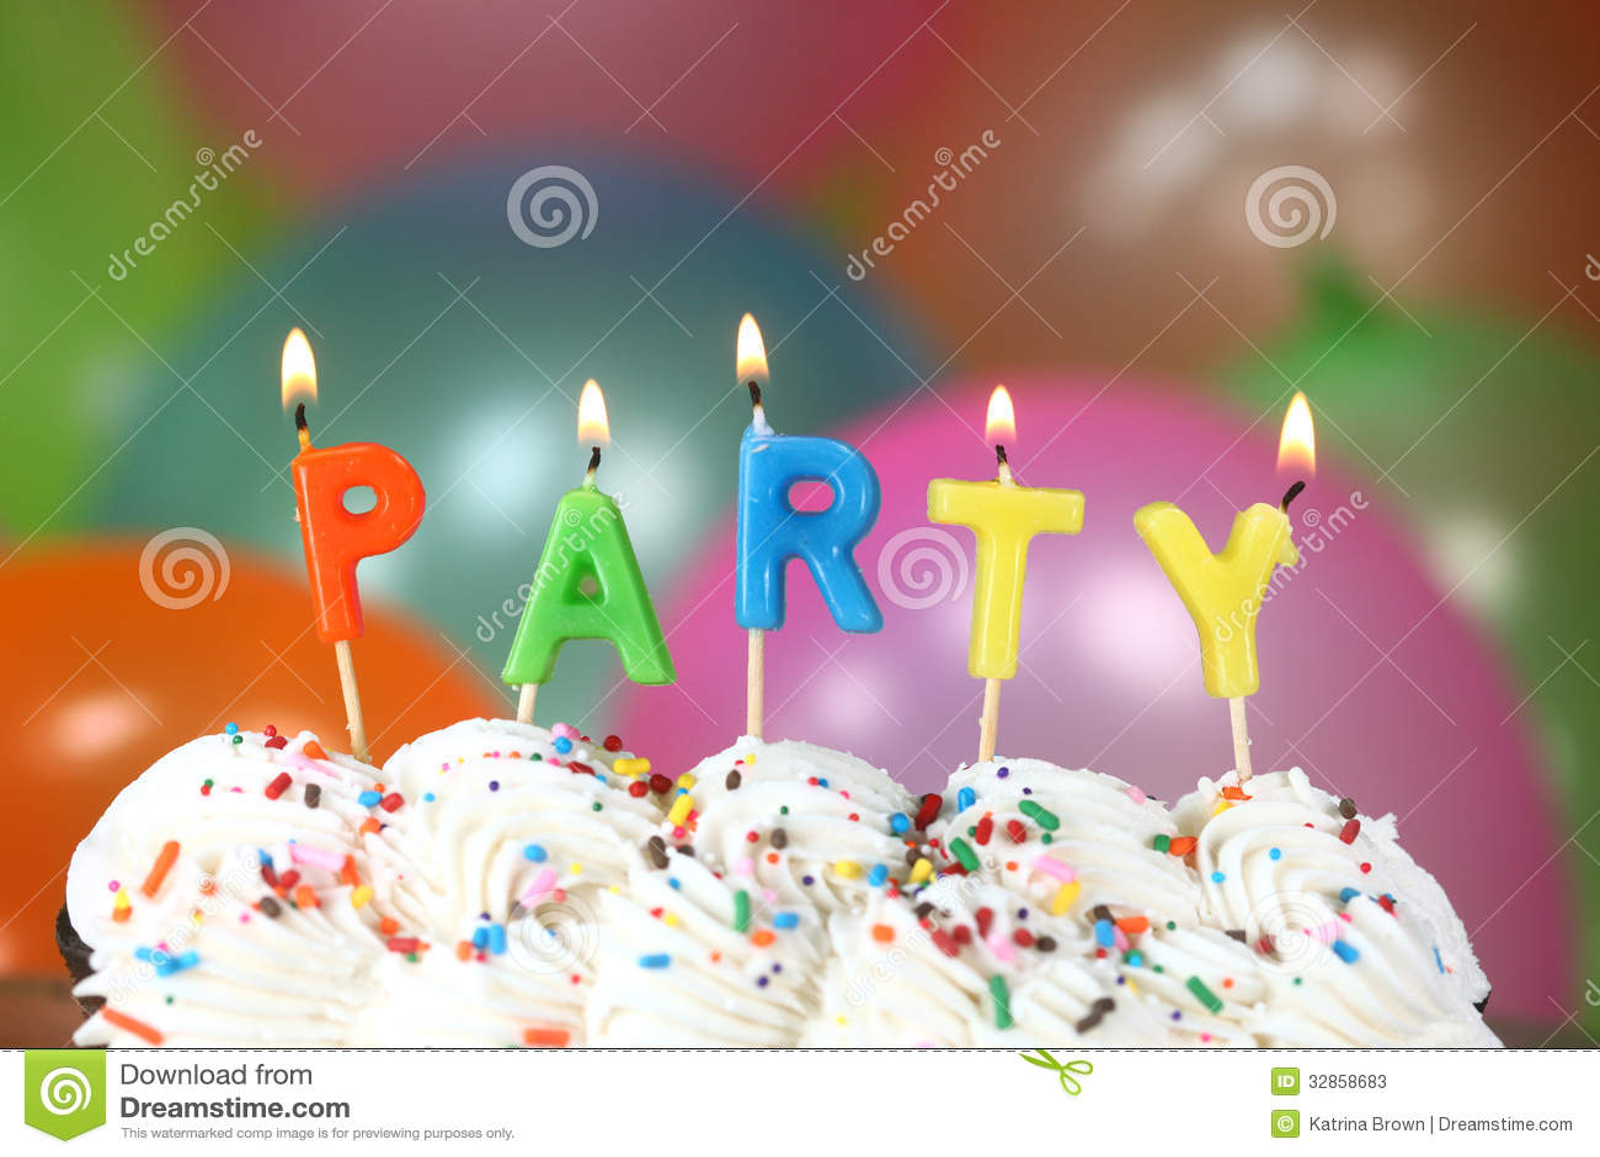 Celebration Birthday Cake With Candles Royalty Free Stock Image